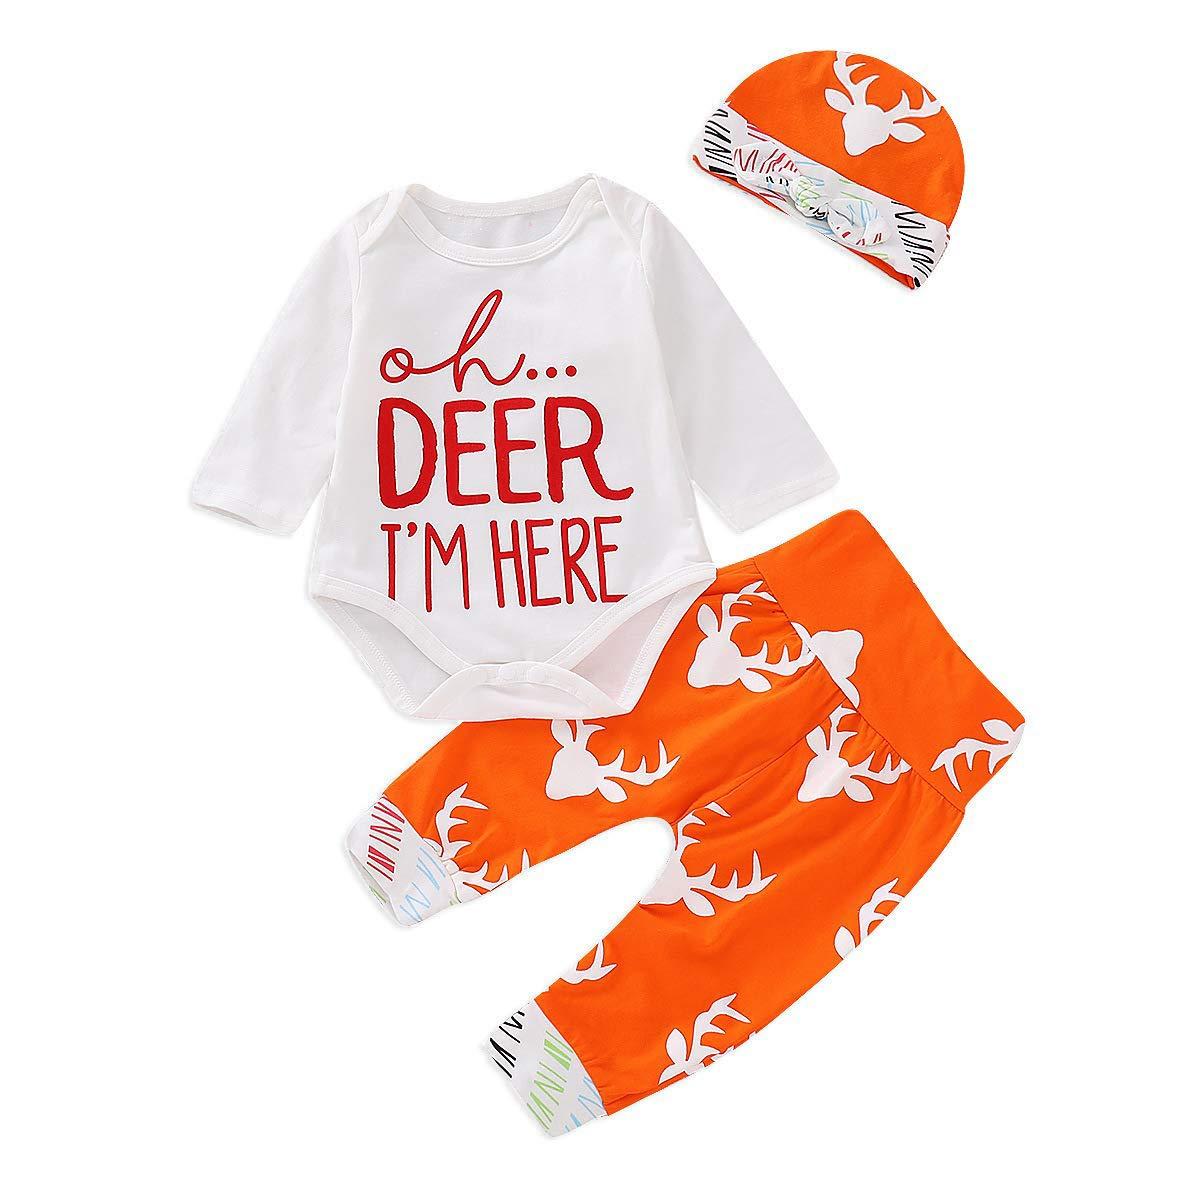 Caibiet PANTS ユニセックスベビー 3 - 6 Months Newborn Elk Xmas Sets B07JX4XXCX